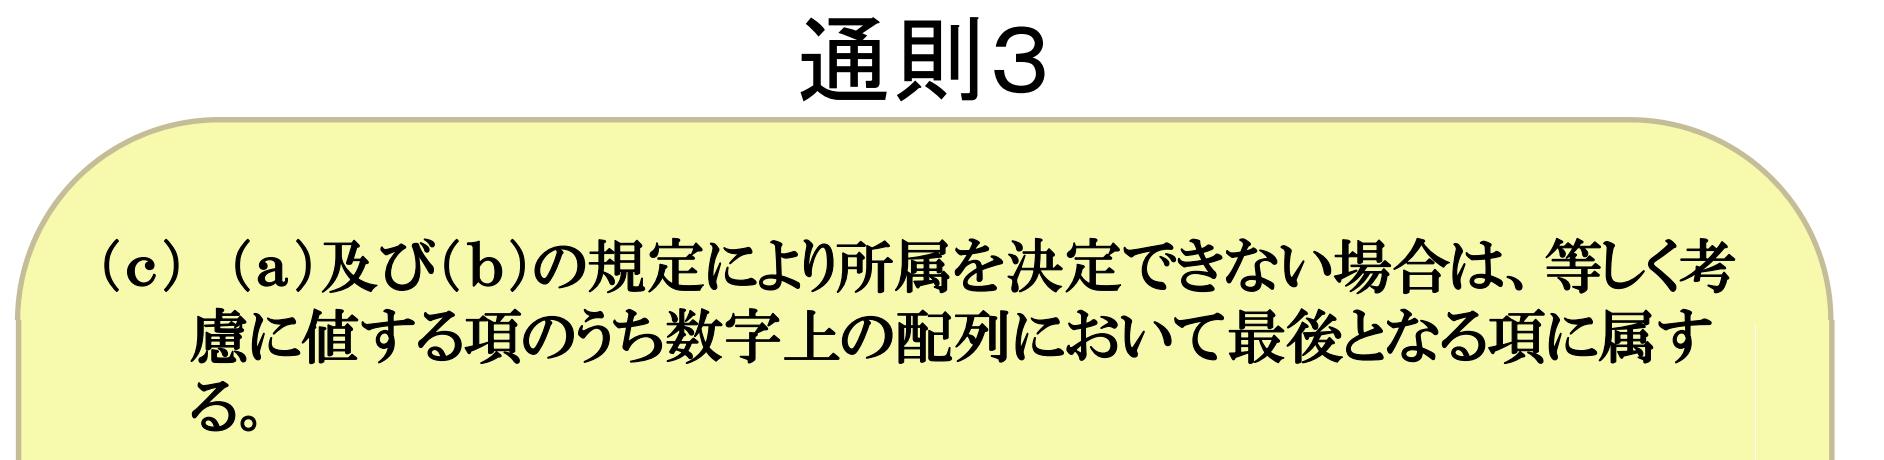 HSコード通則3(c)